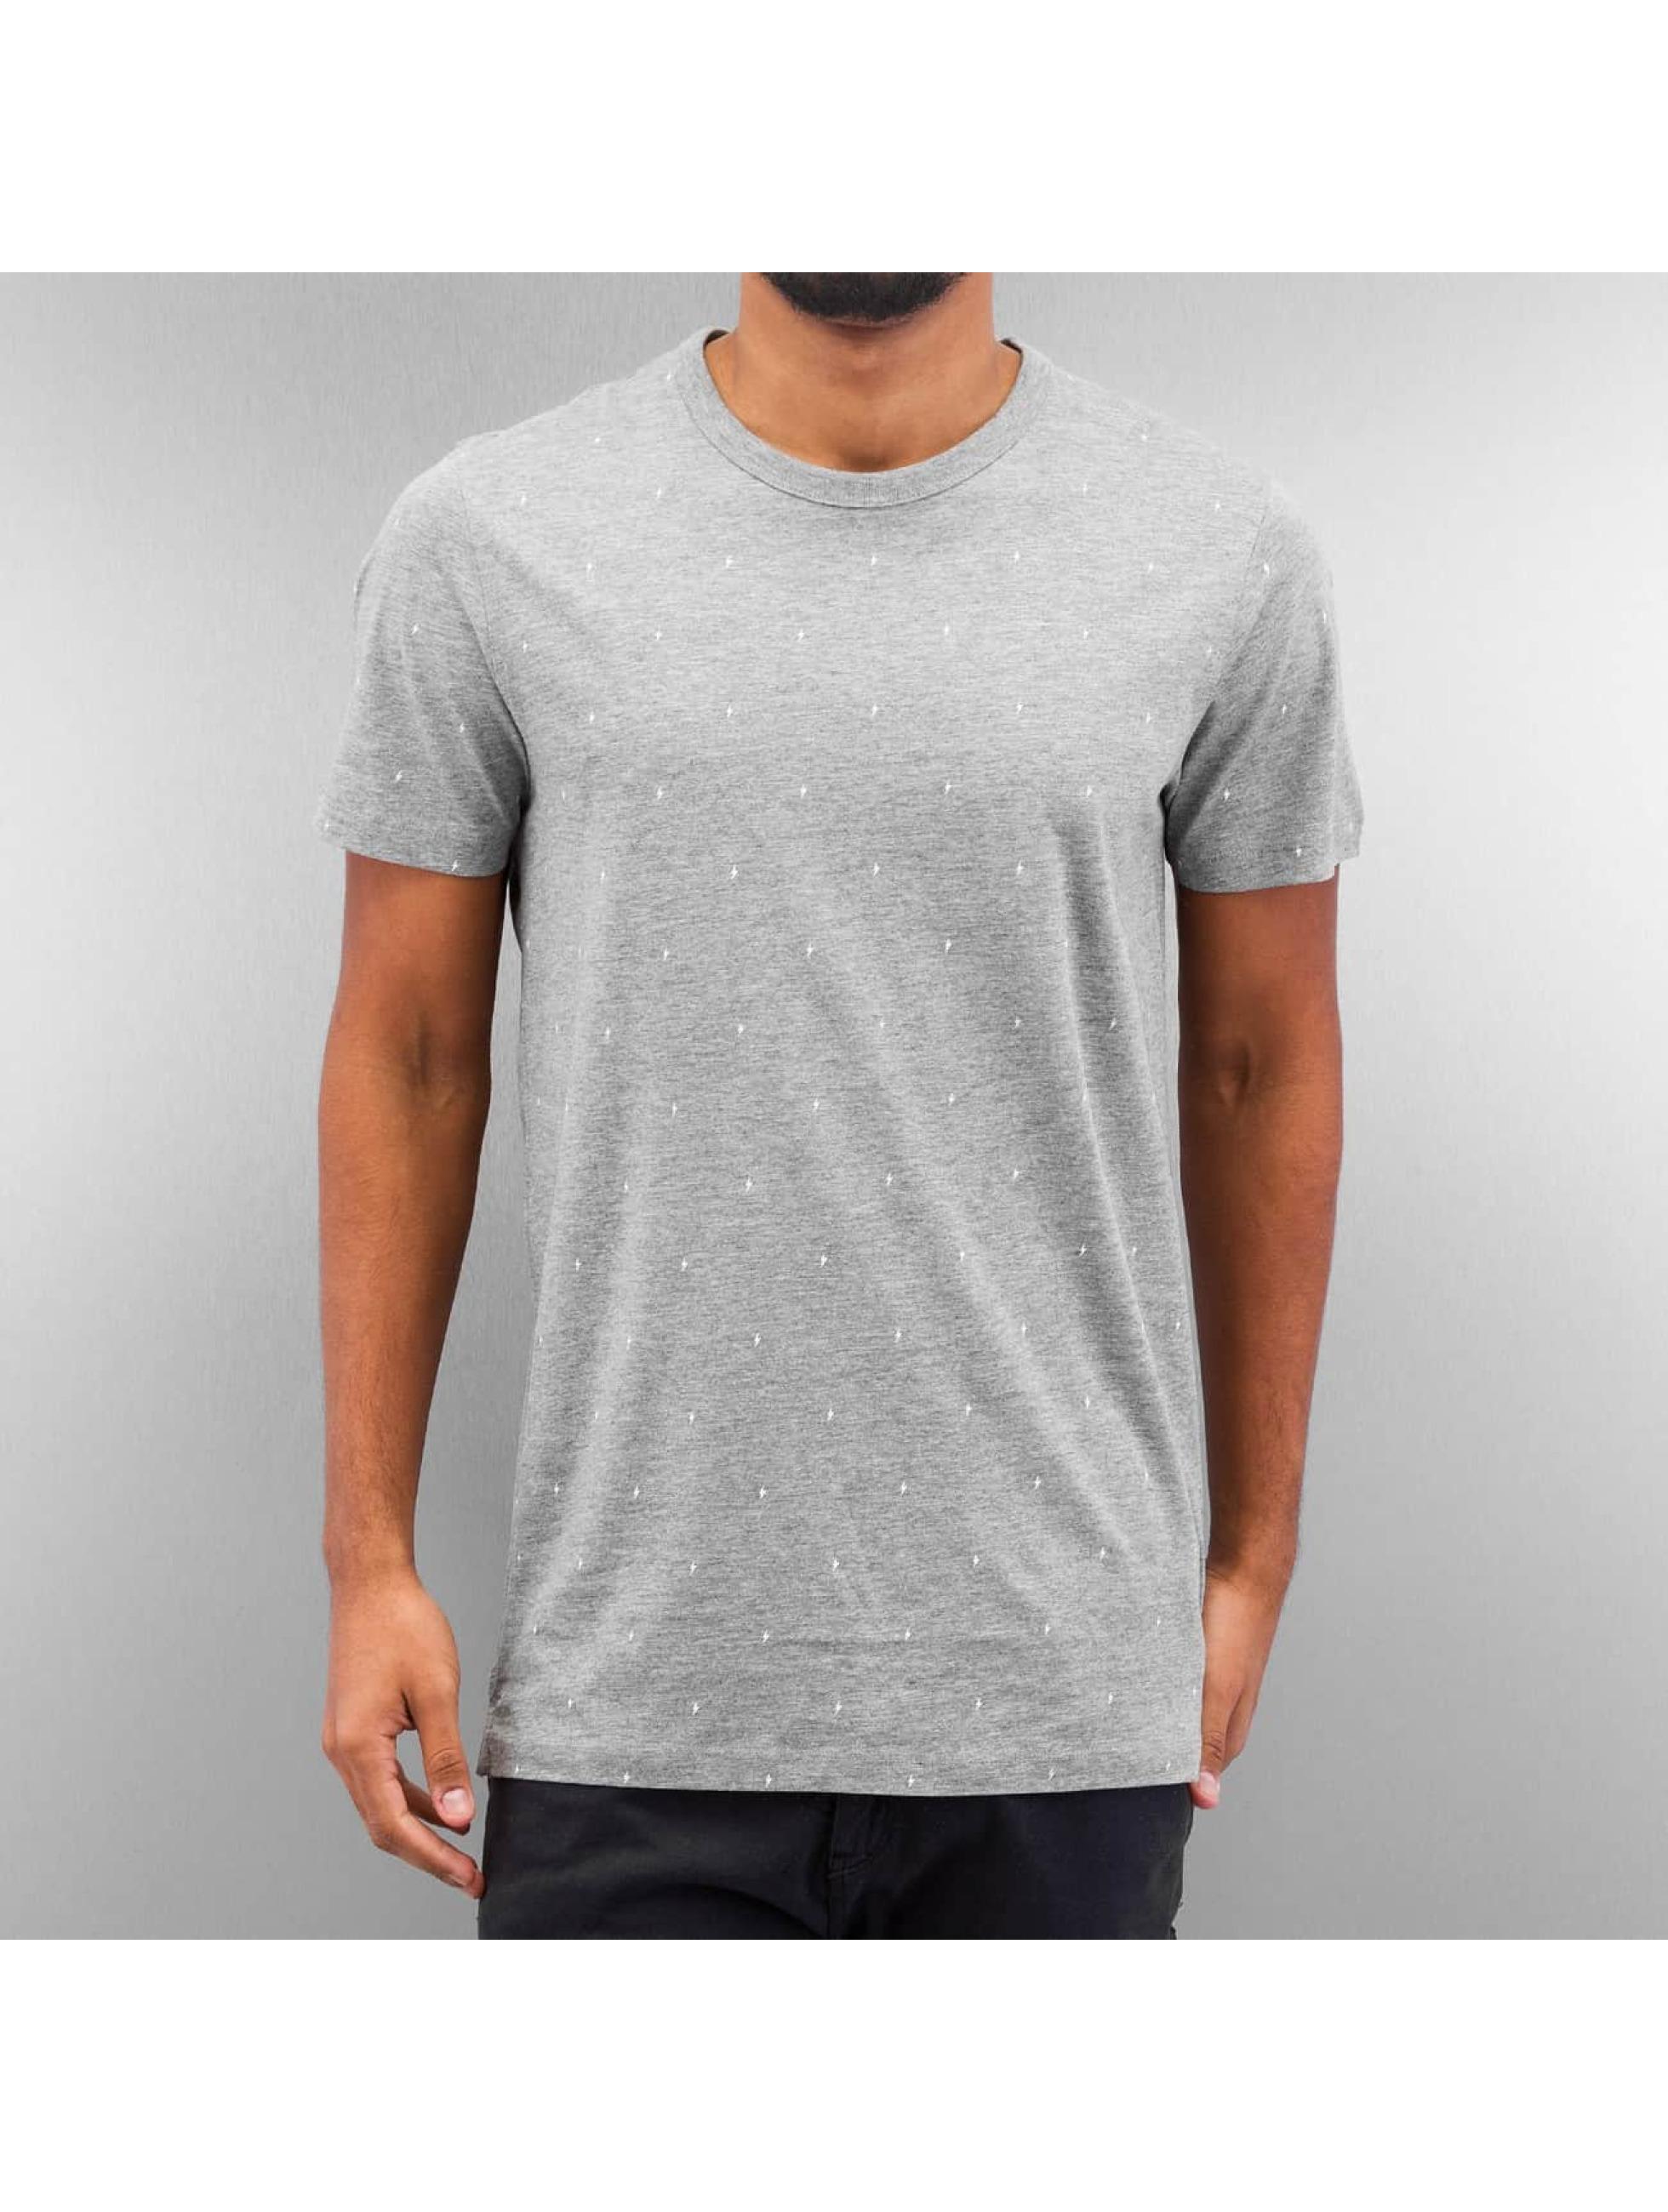 T-Shirt jjLightning in grau